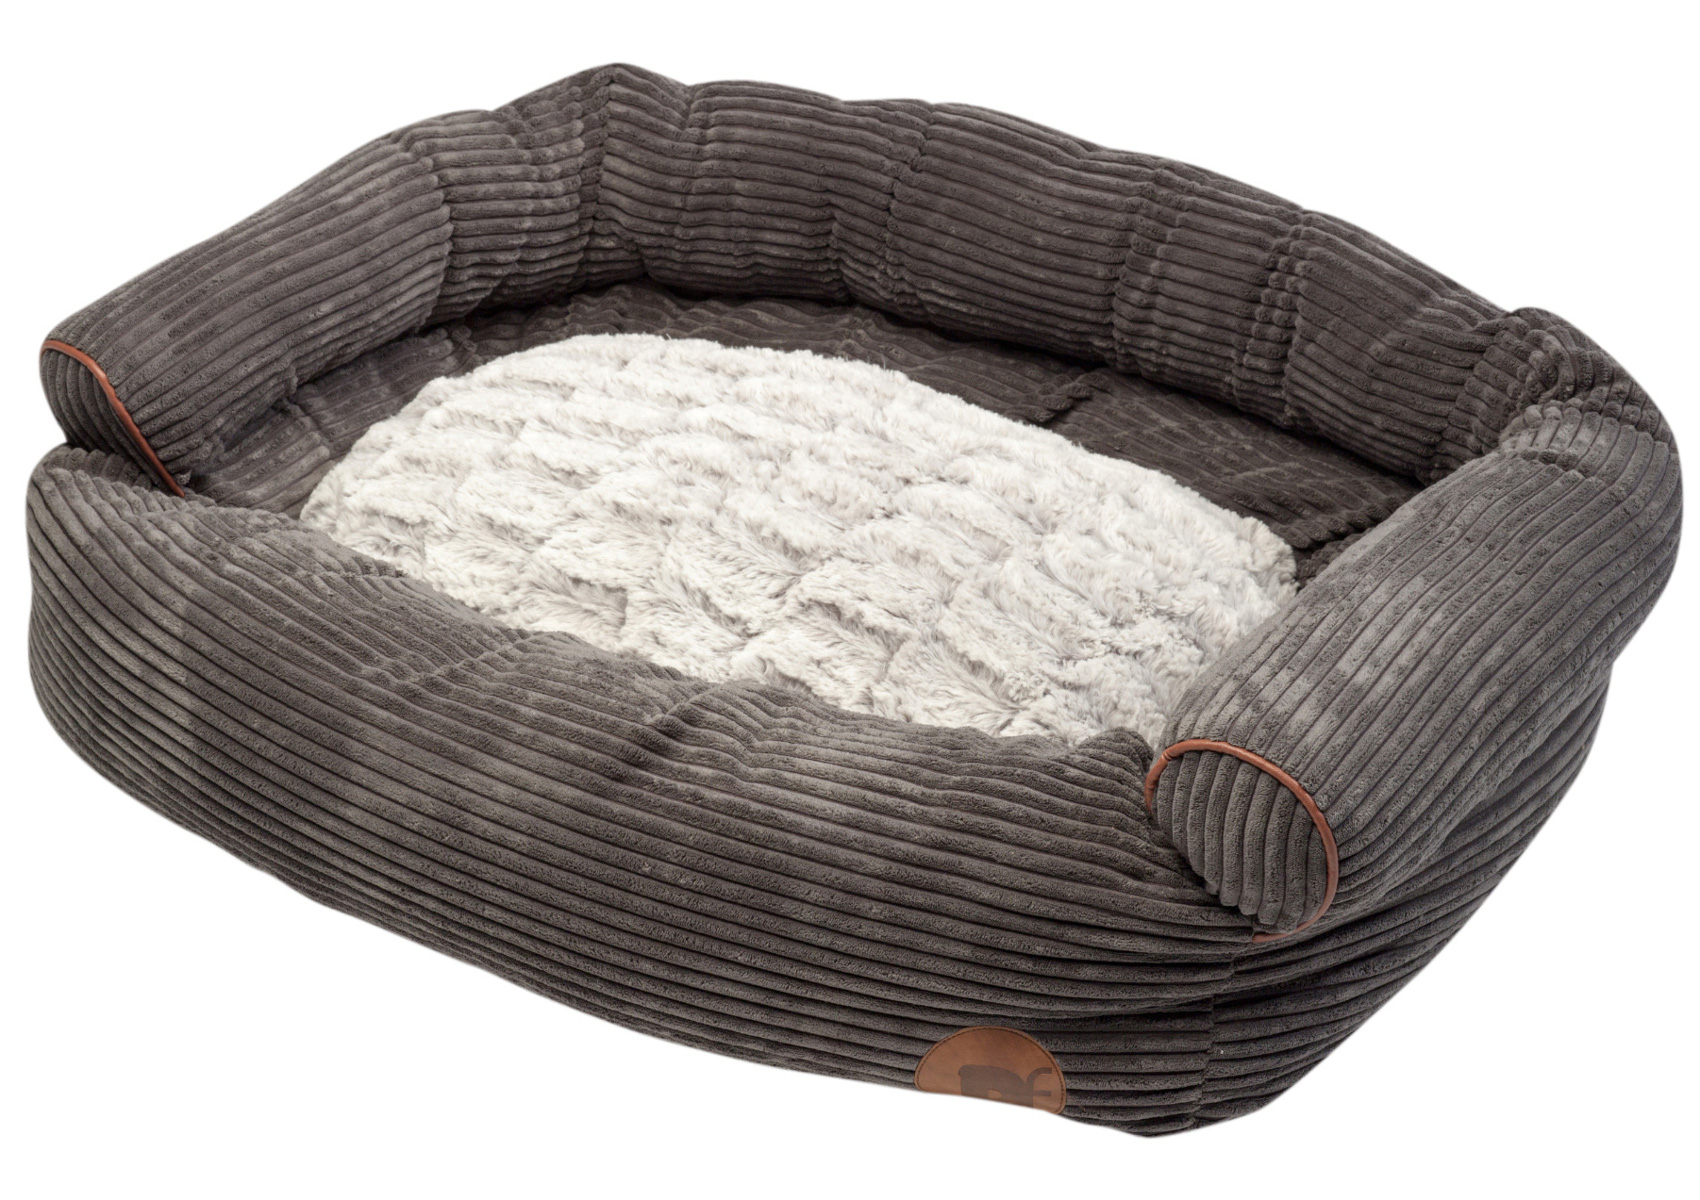 Superb Jumbo Dog Bed Petface Corduroy XL Sofa Style Pet Basket Faux Fur Cushion  Grey